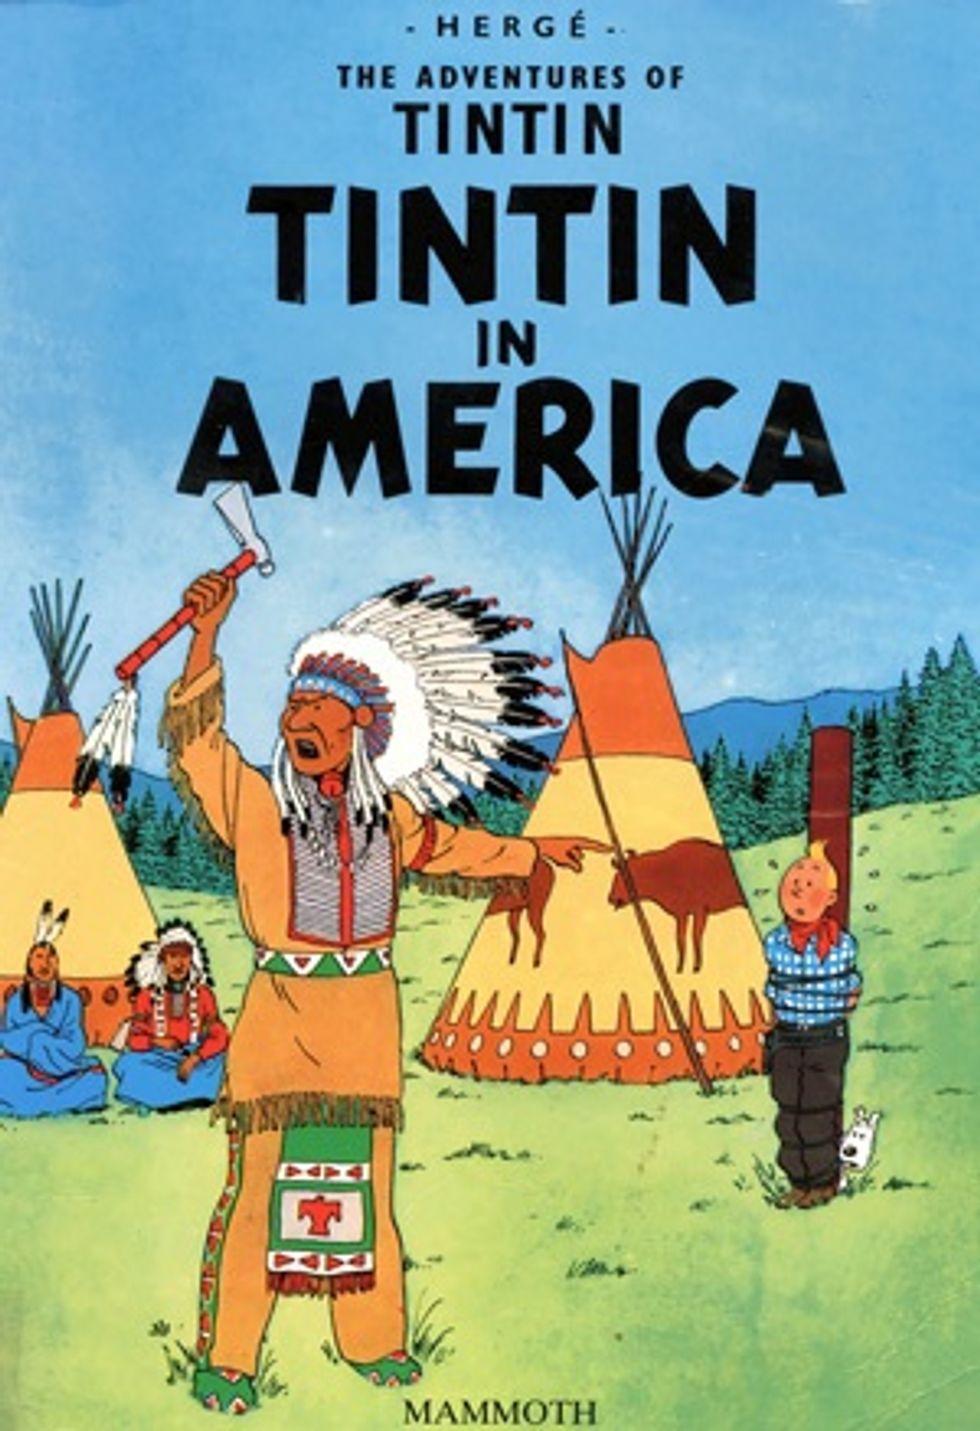 Everyone loves Tintin!